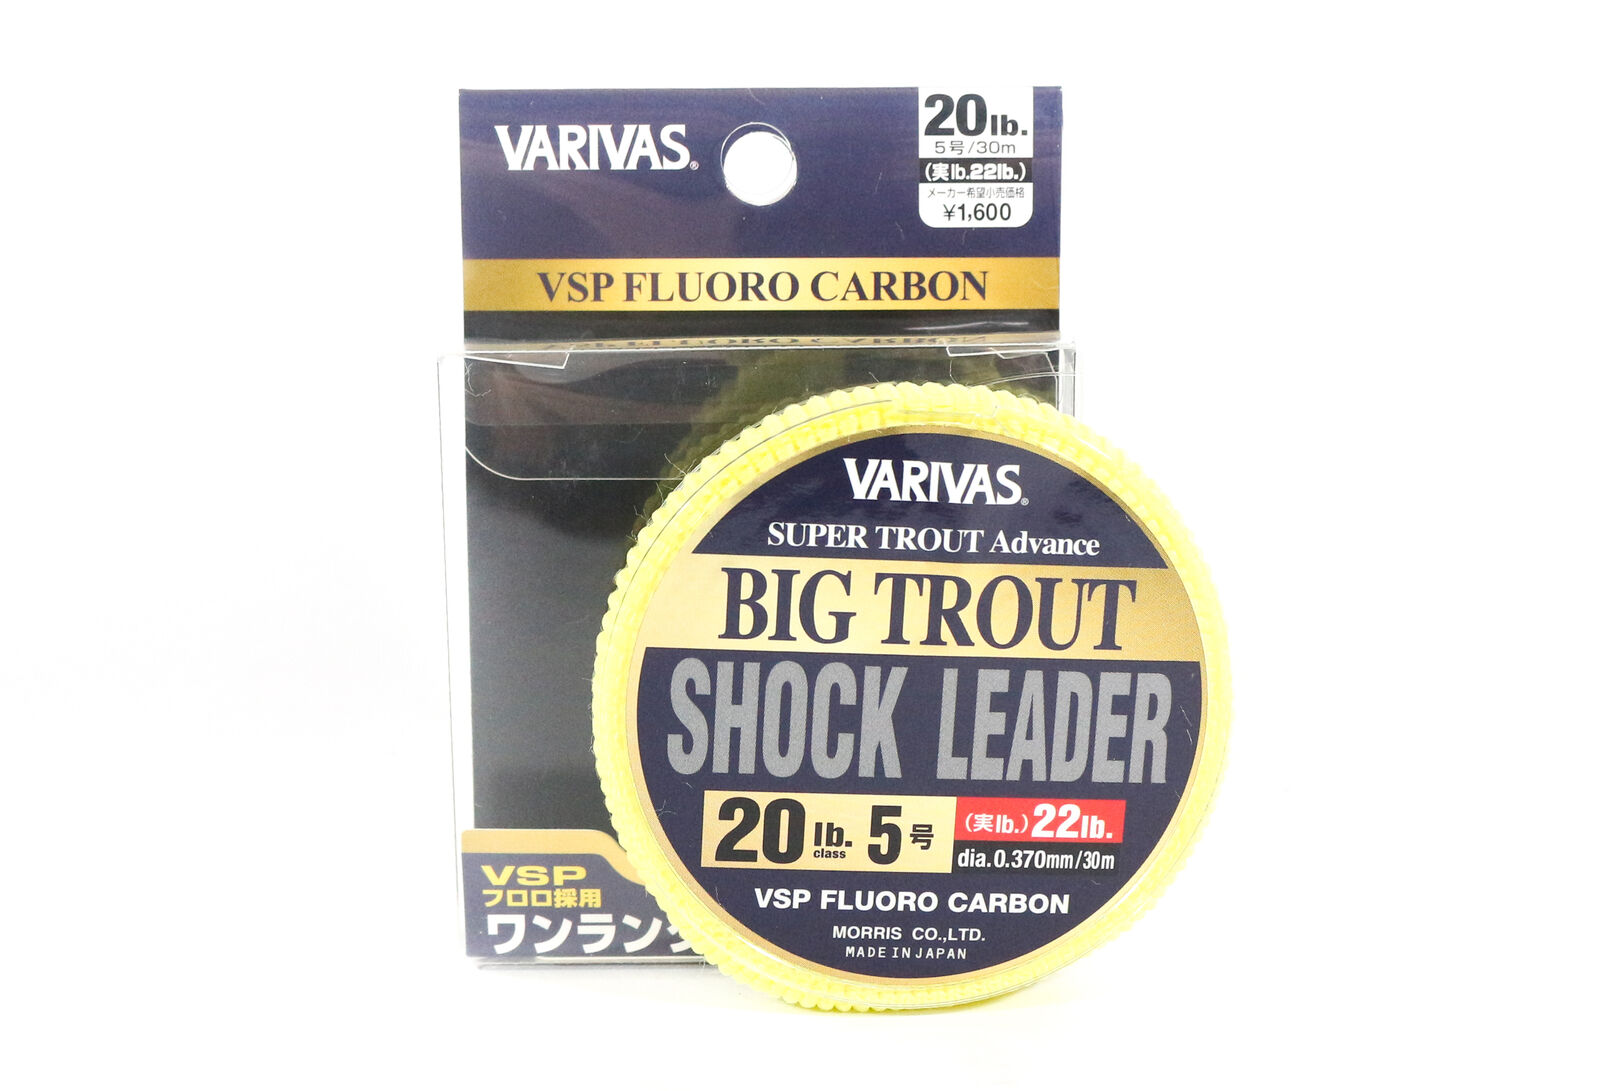 Varivas Fluorocarbon Big Trout Shock Leader Ligne 30m 20lb 7355